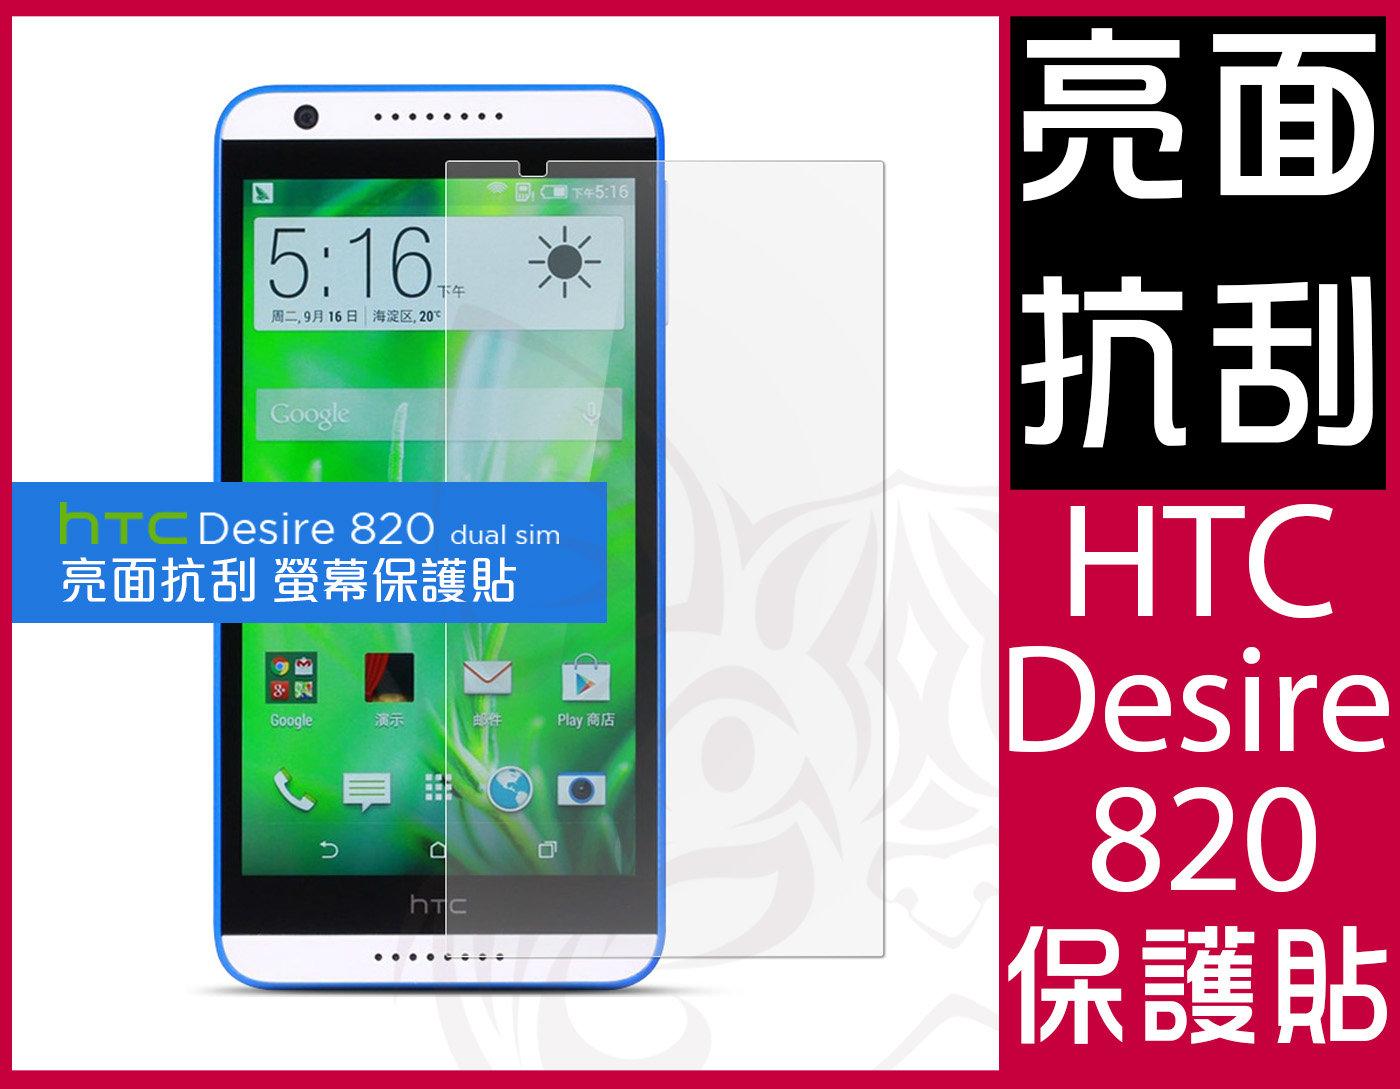 HTC Desire 820 亮面保護貼【A-HTC-010】保護貼 亮面貼 Alice3C